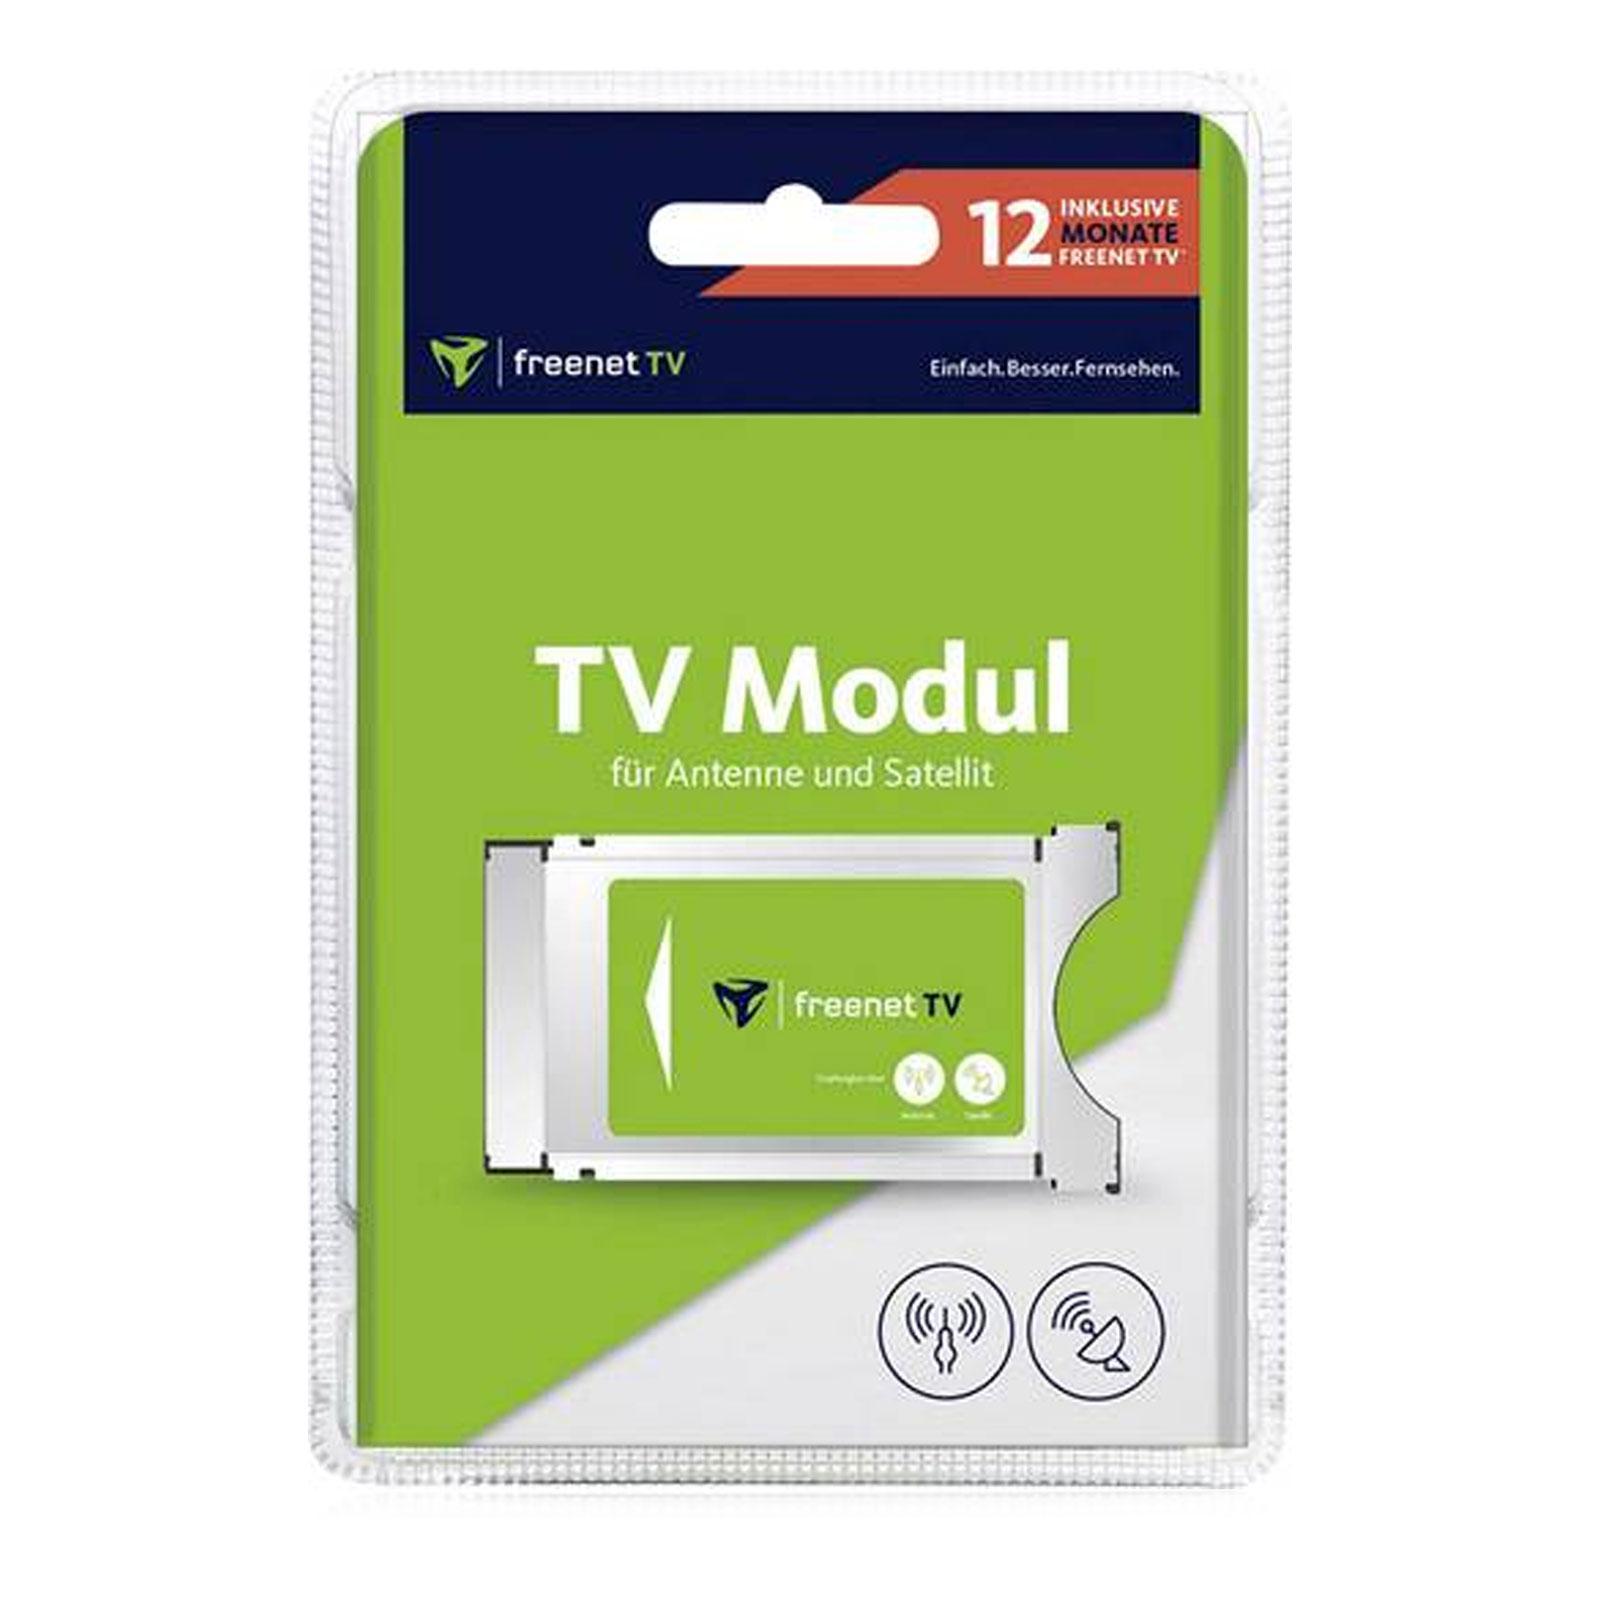 freenet tv hd ci modul f r dvb t2 antenne satellit hd. Black Bedroom Furniture Sets. Home Design Ideas